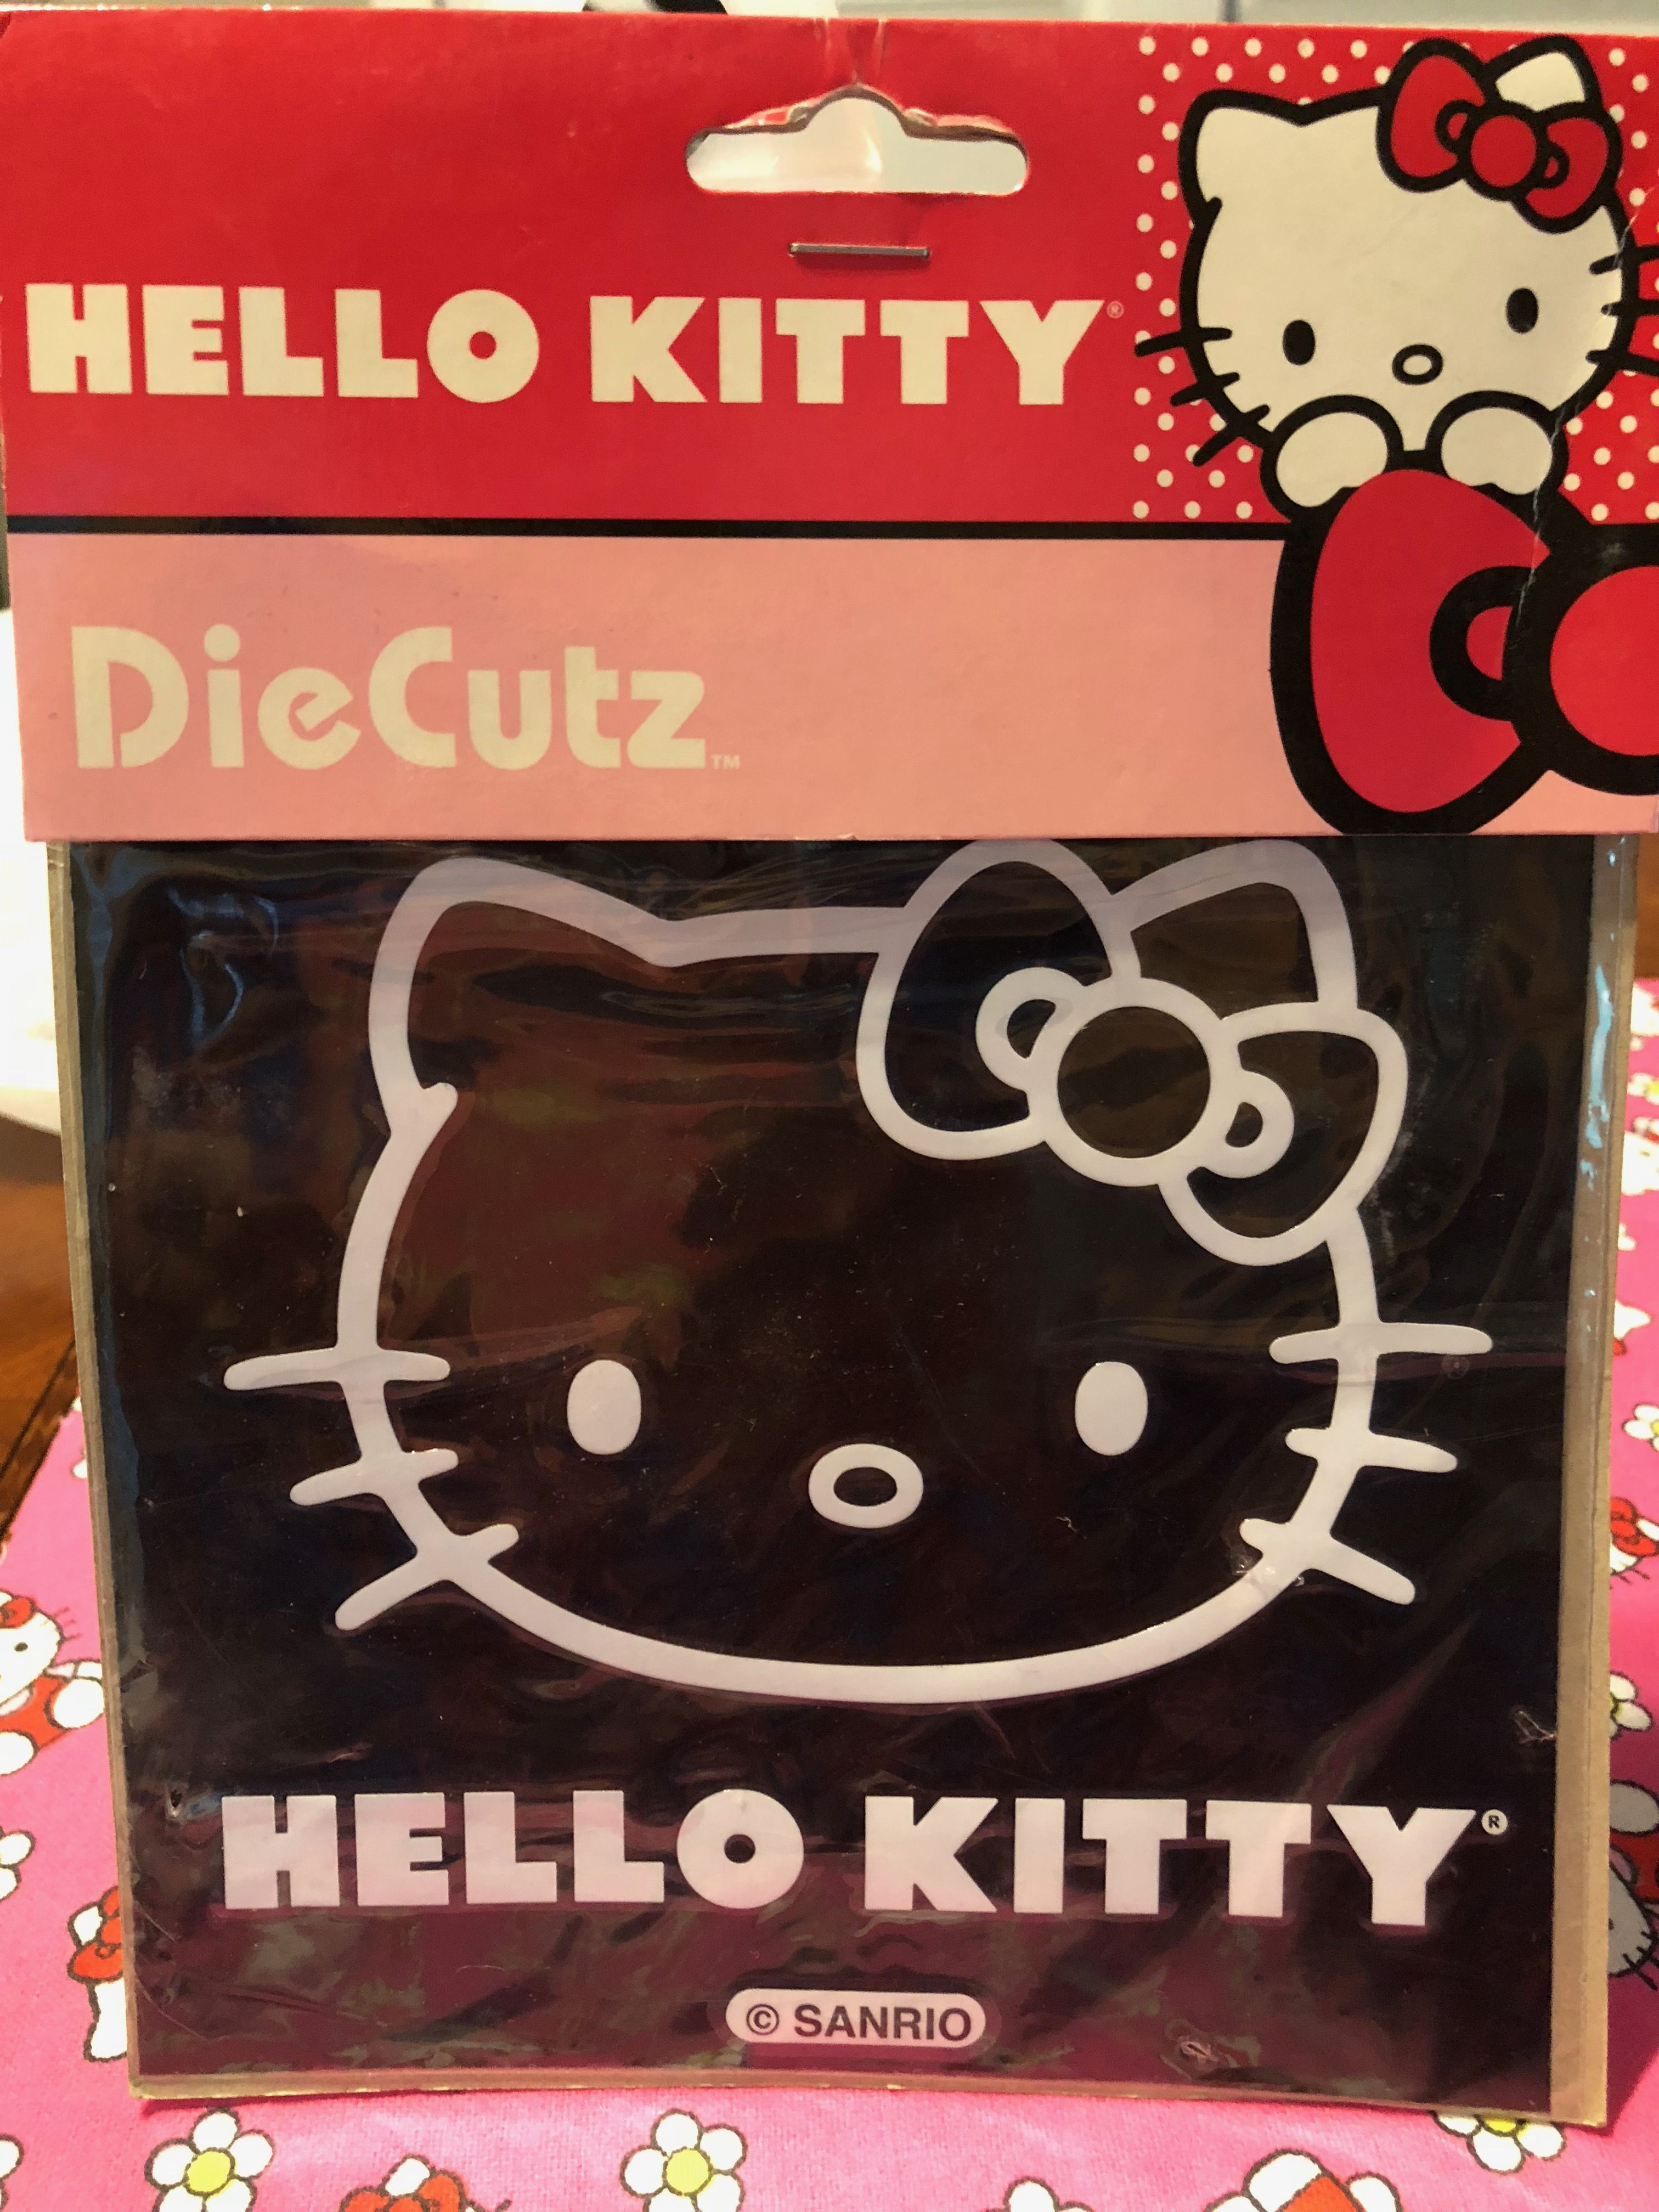 Hello Kitty Car Window Decal Hello Kitty Car Hello Kitty Pep Boys [ 4032 x 3024 Pixel ]